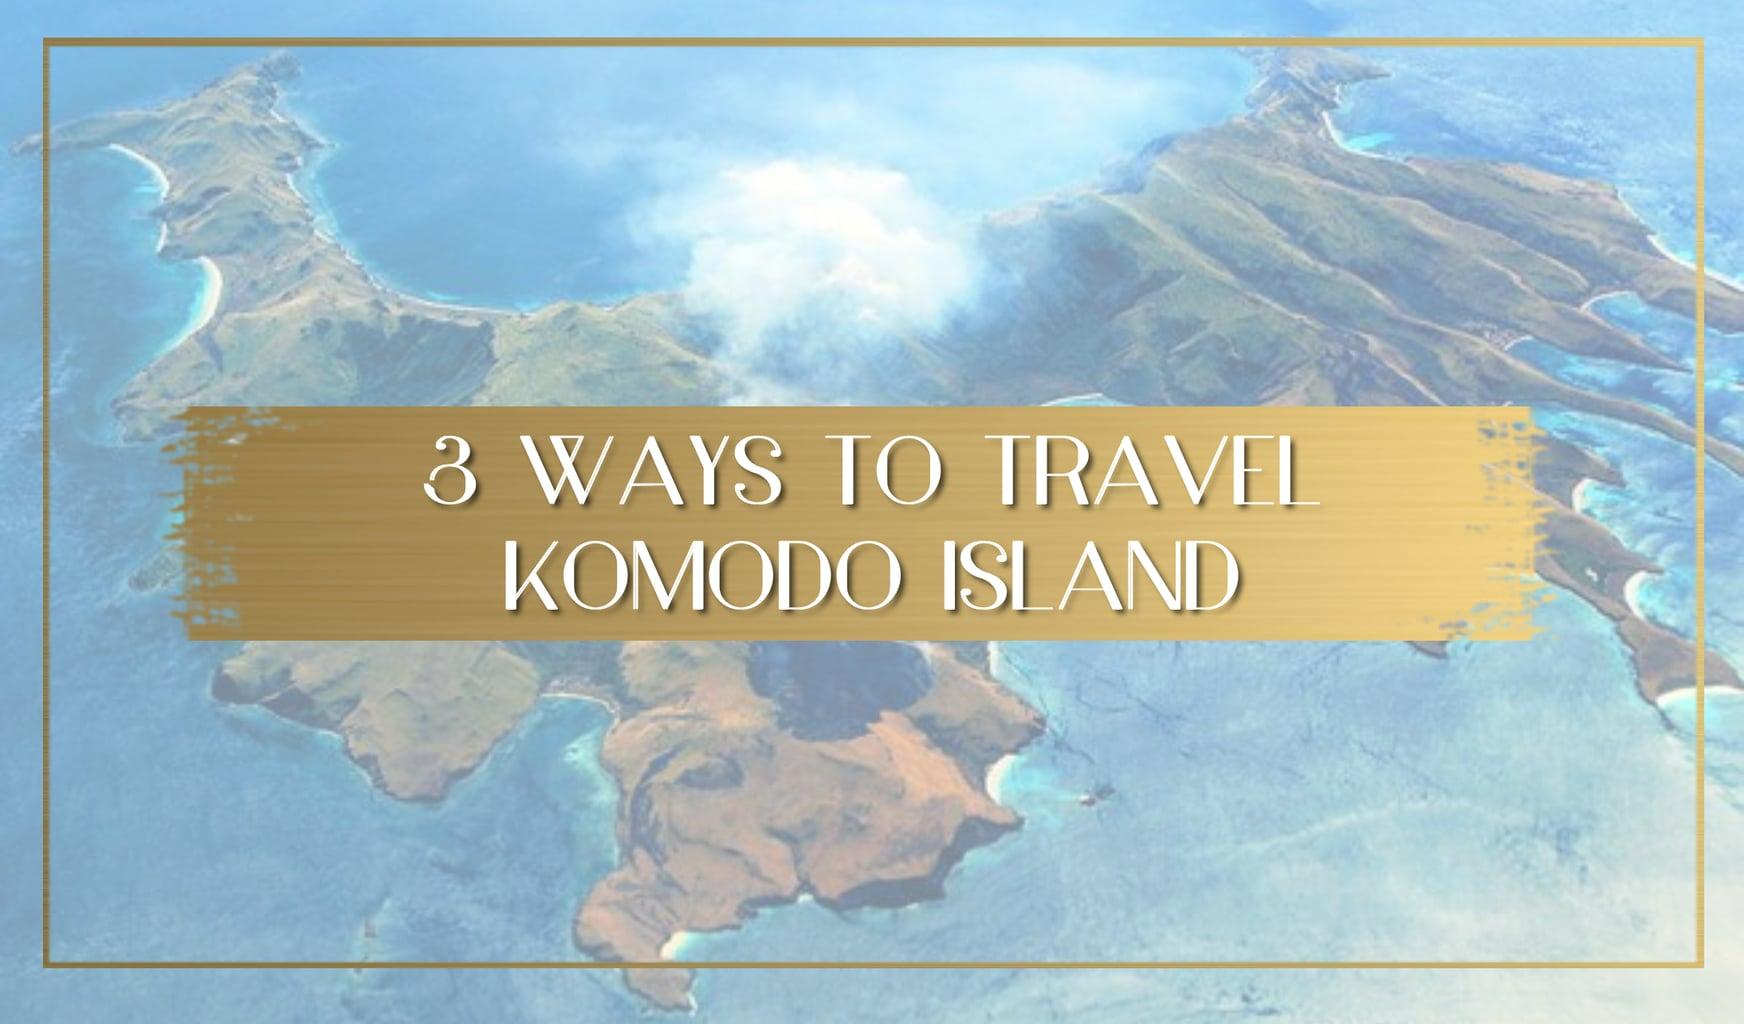 3 Ways to Travel Komodo Island main